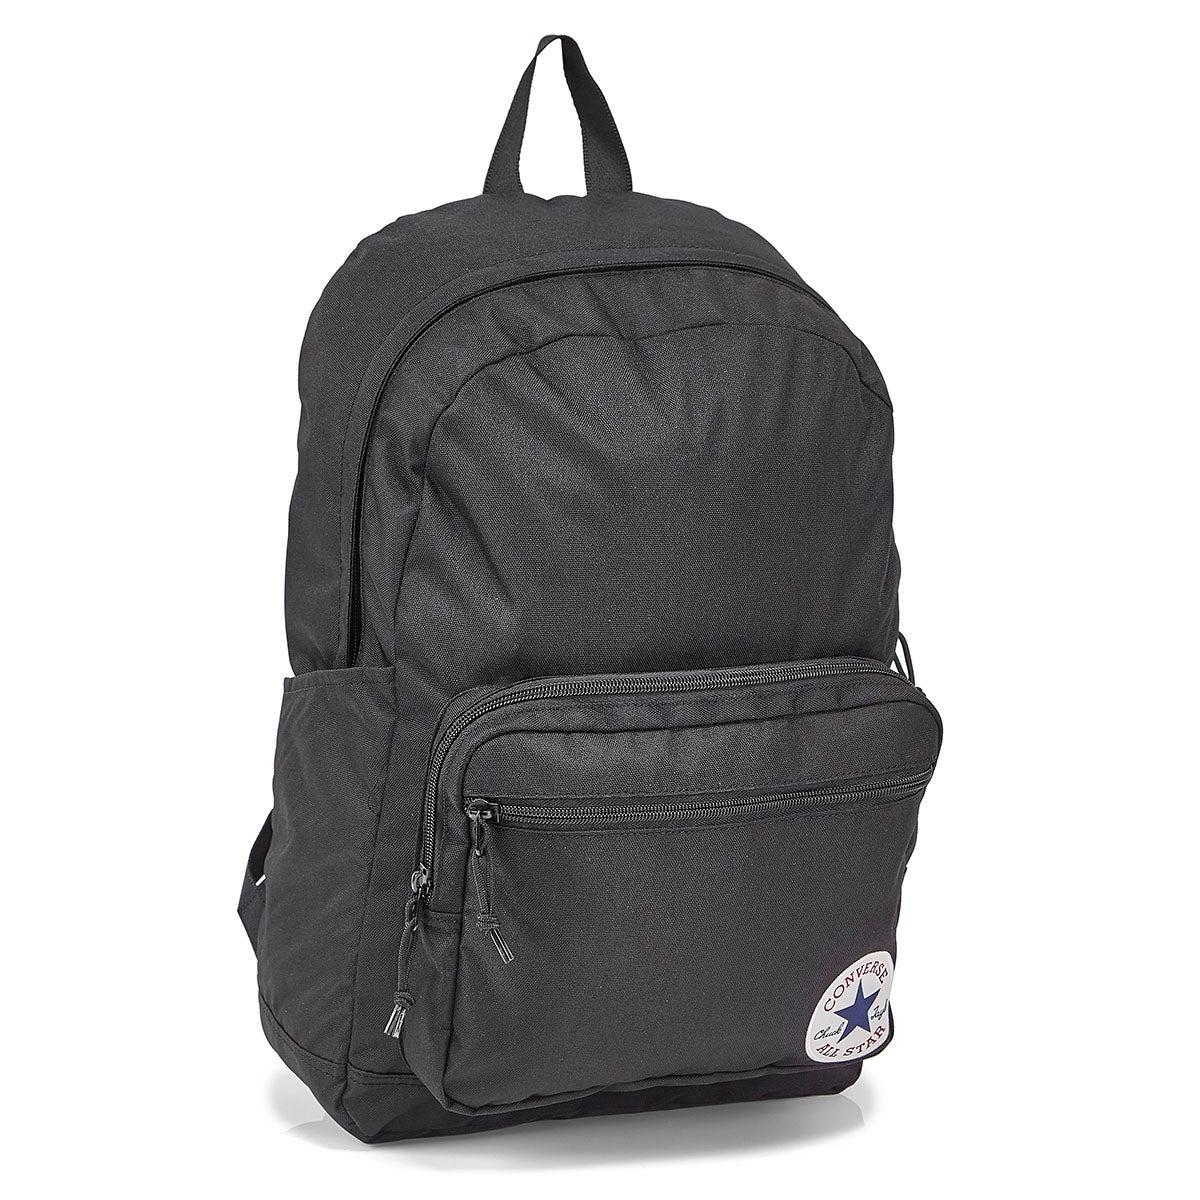 Converse Go 2 black backpack